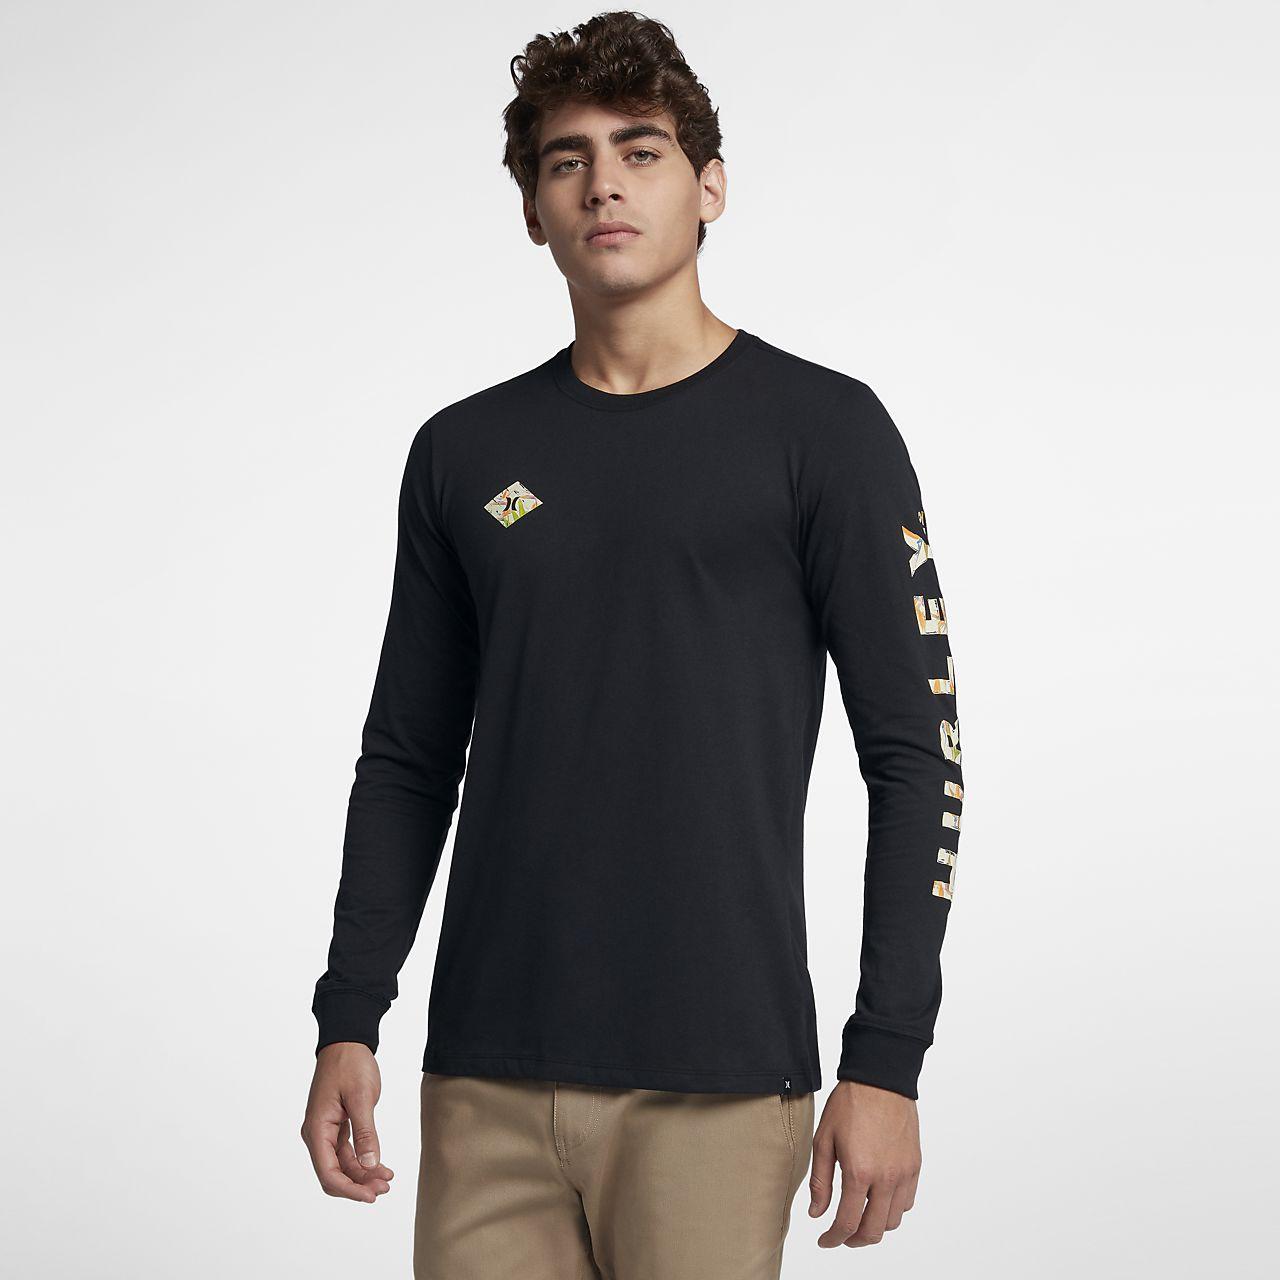 c37bbdc8 Hurley Dri-FIT Fronds Men's Long-Sleeve T-Shirt. Nike.com